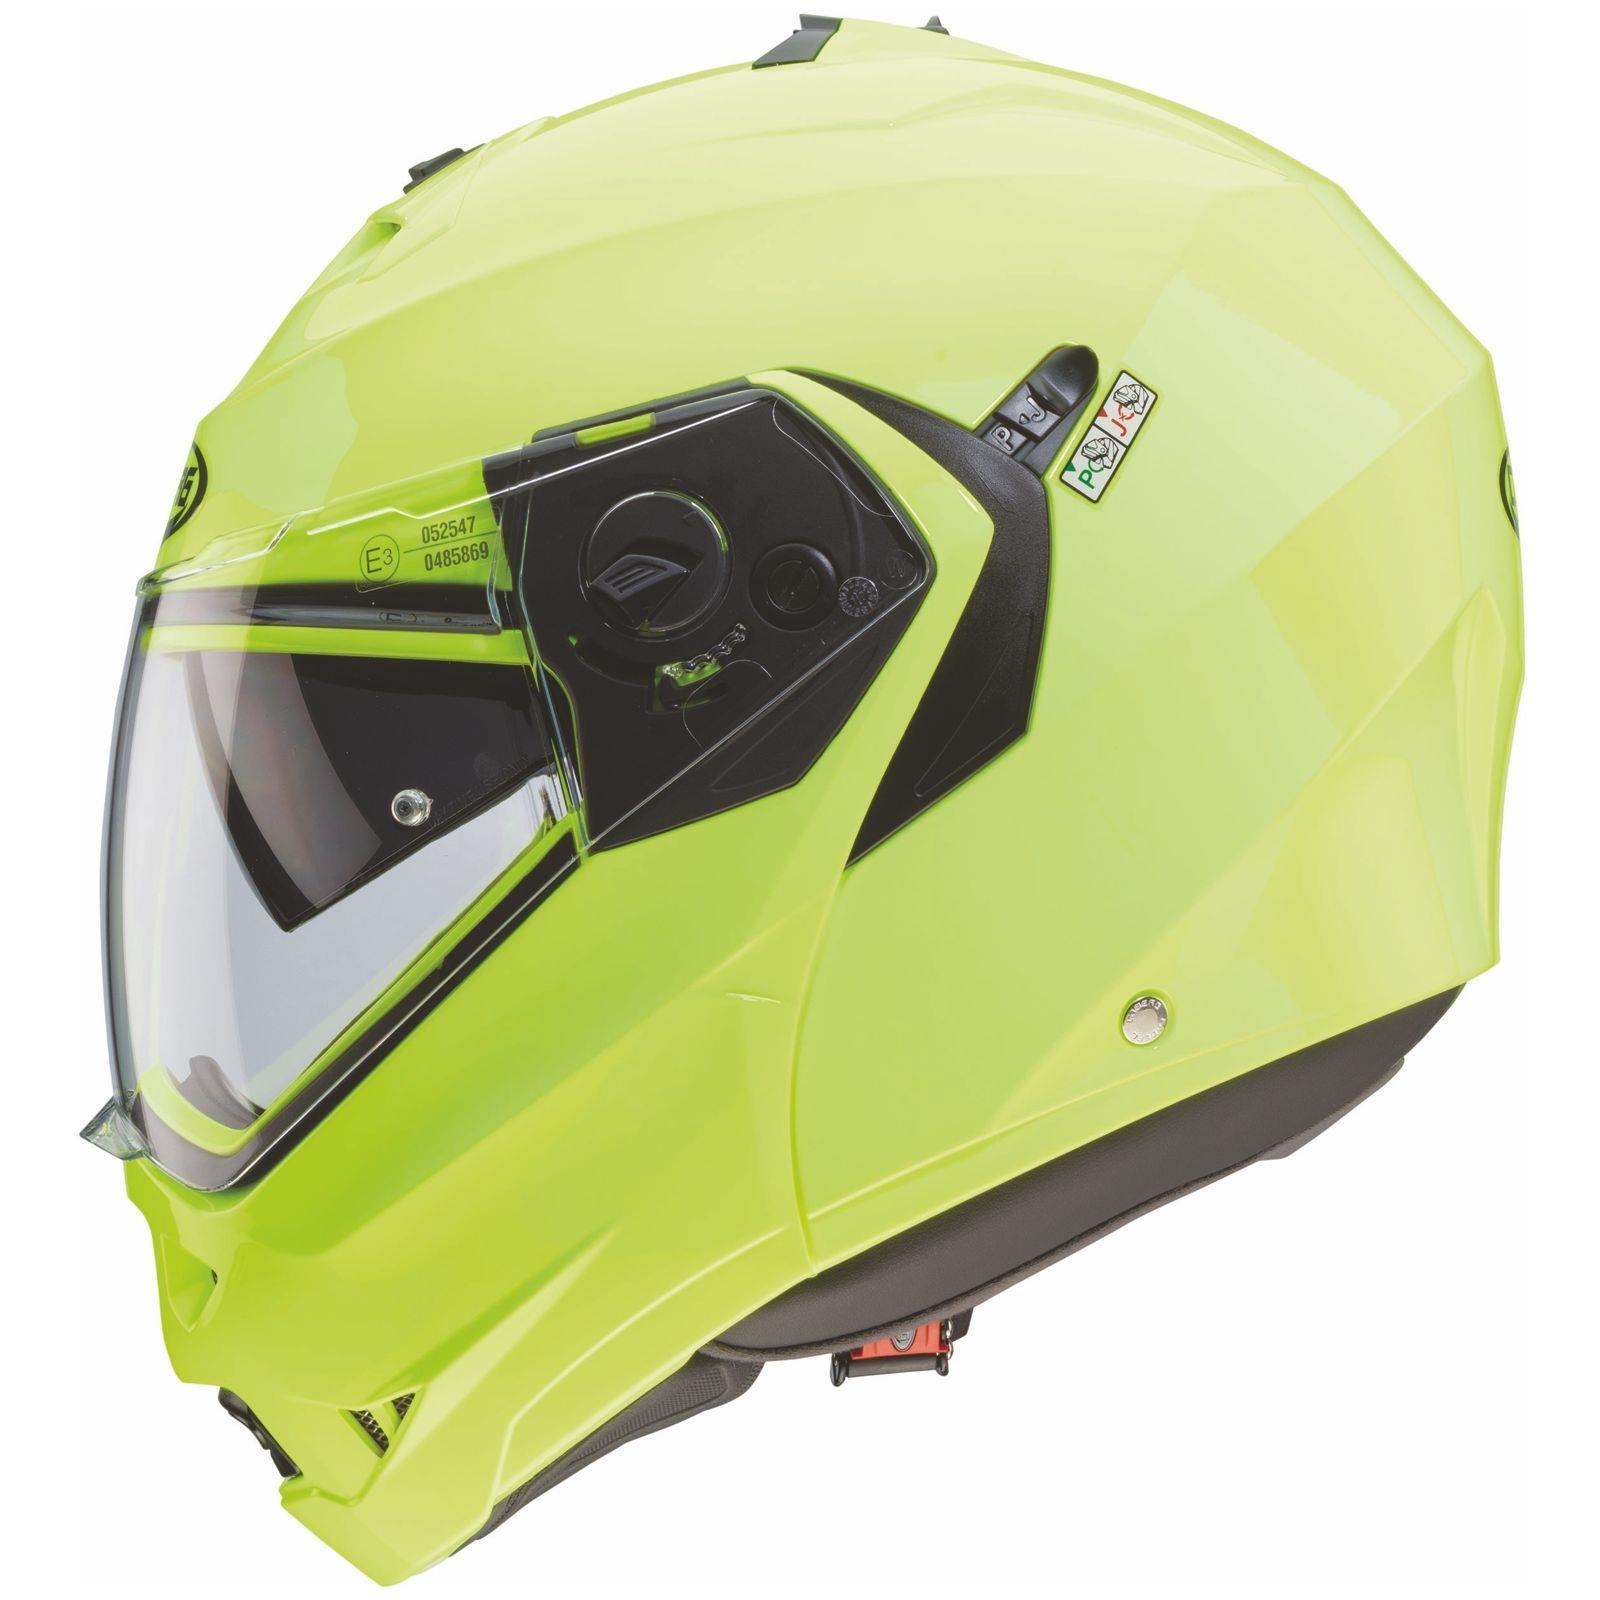 Caberg-Klapp-Helm-Duke-II-2-Motorrad-Belueftet-Sonnenblende-Pinlock-Visier-Jet Indexbild 24